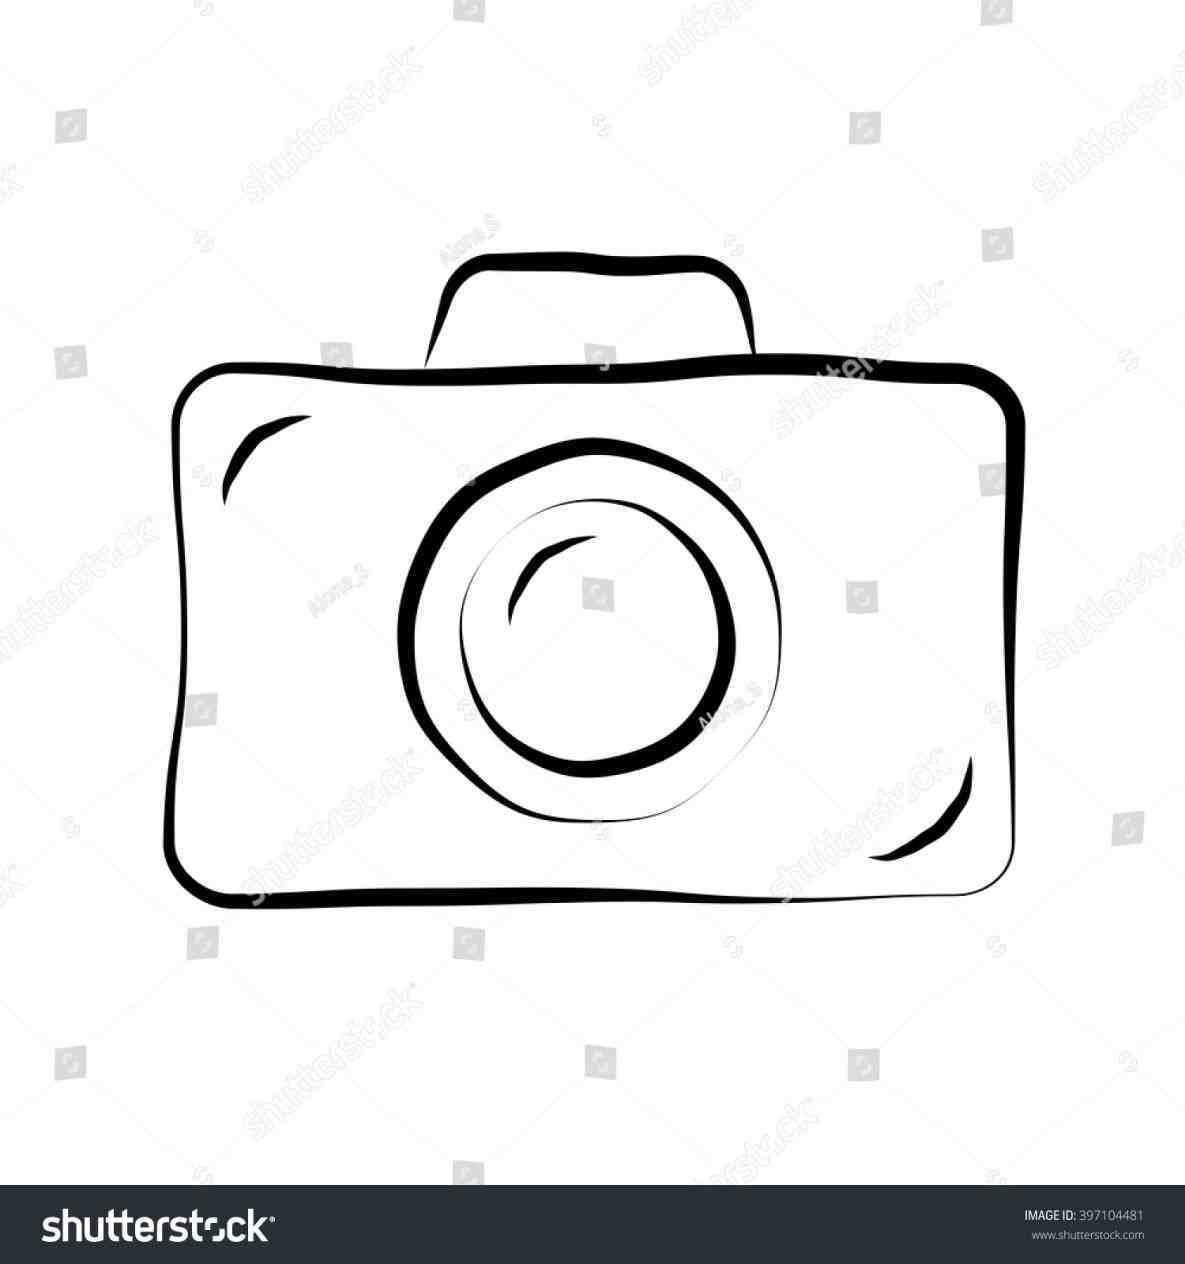 hight resolution of 1185x1264 sketch camera by manuel j iniesta httpiniestailustraciones simple camera sketch